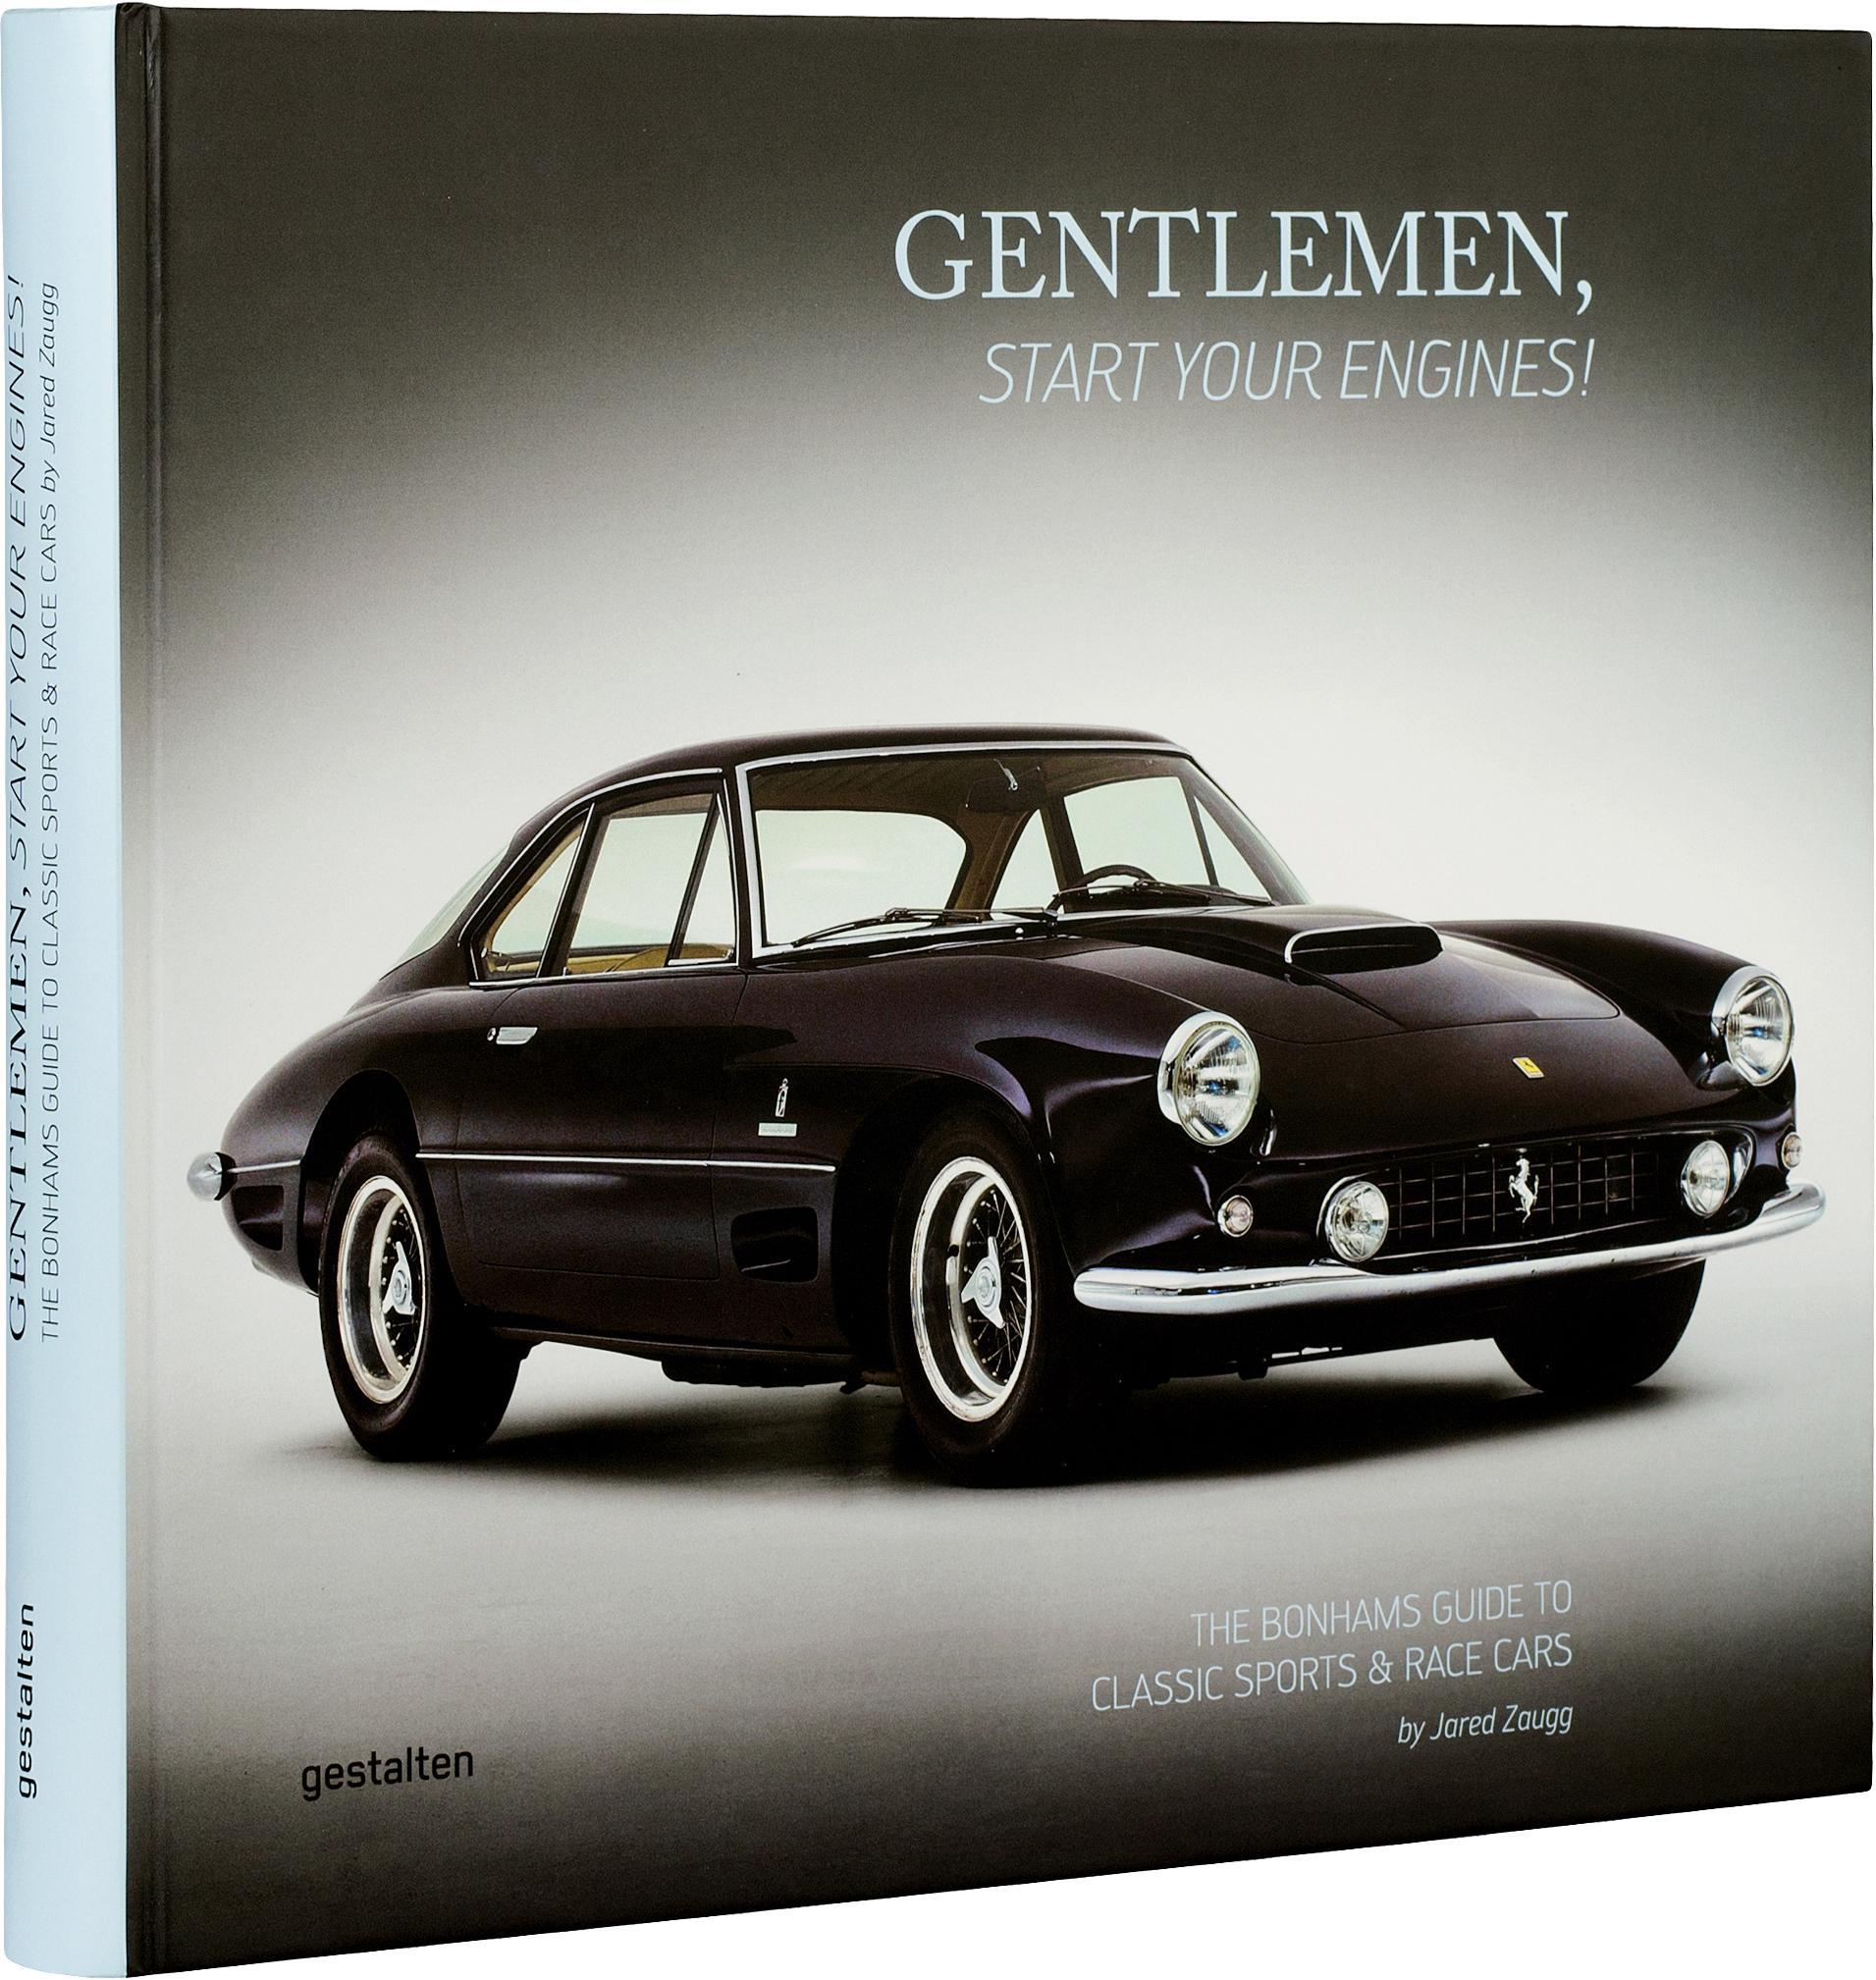 Album Gentlemen, start your engines!, Papier, twarda okładka, Wielobarwny, 27 x 30 cm